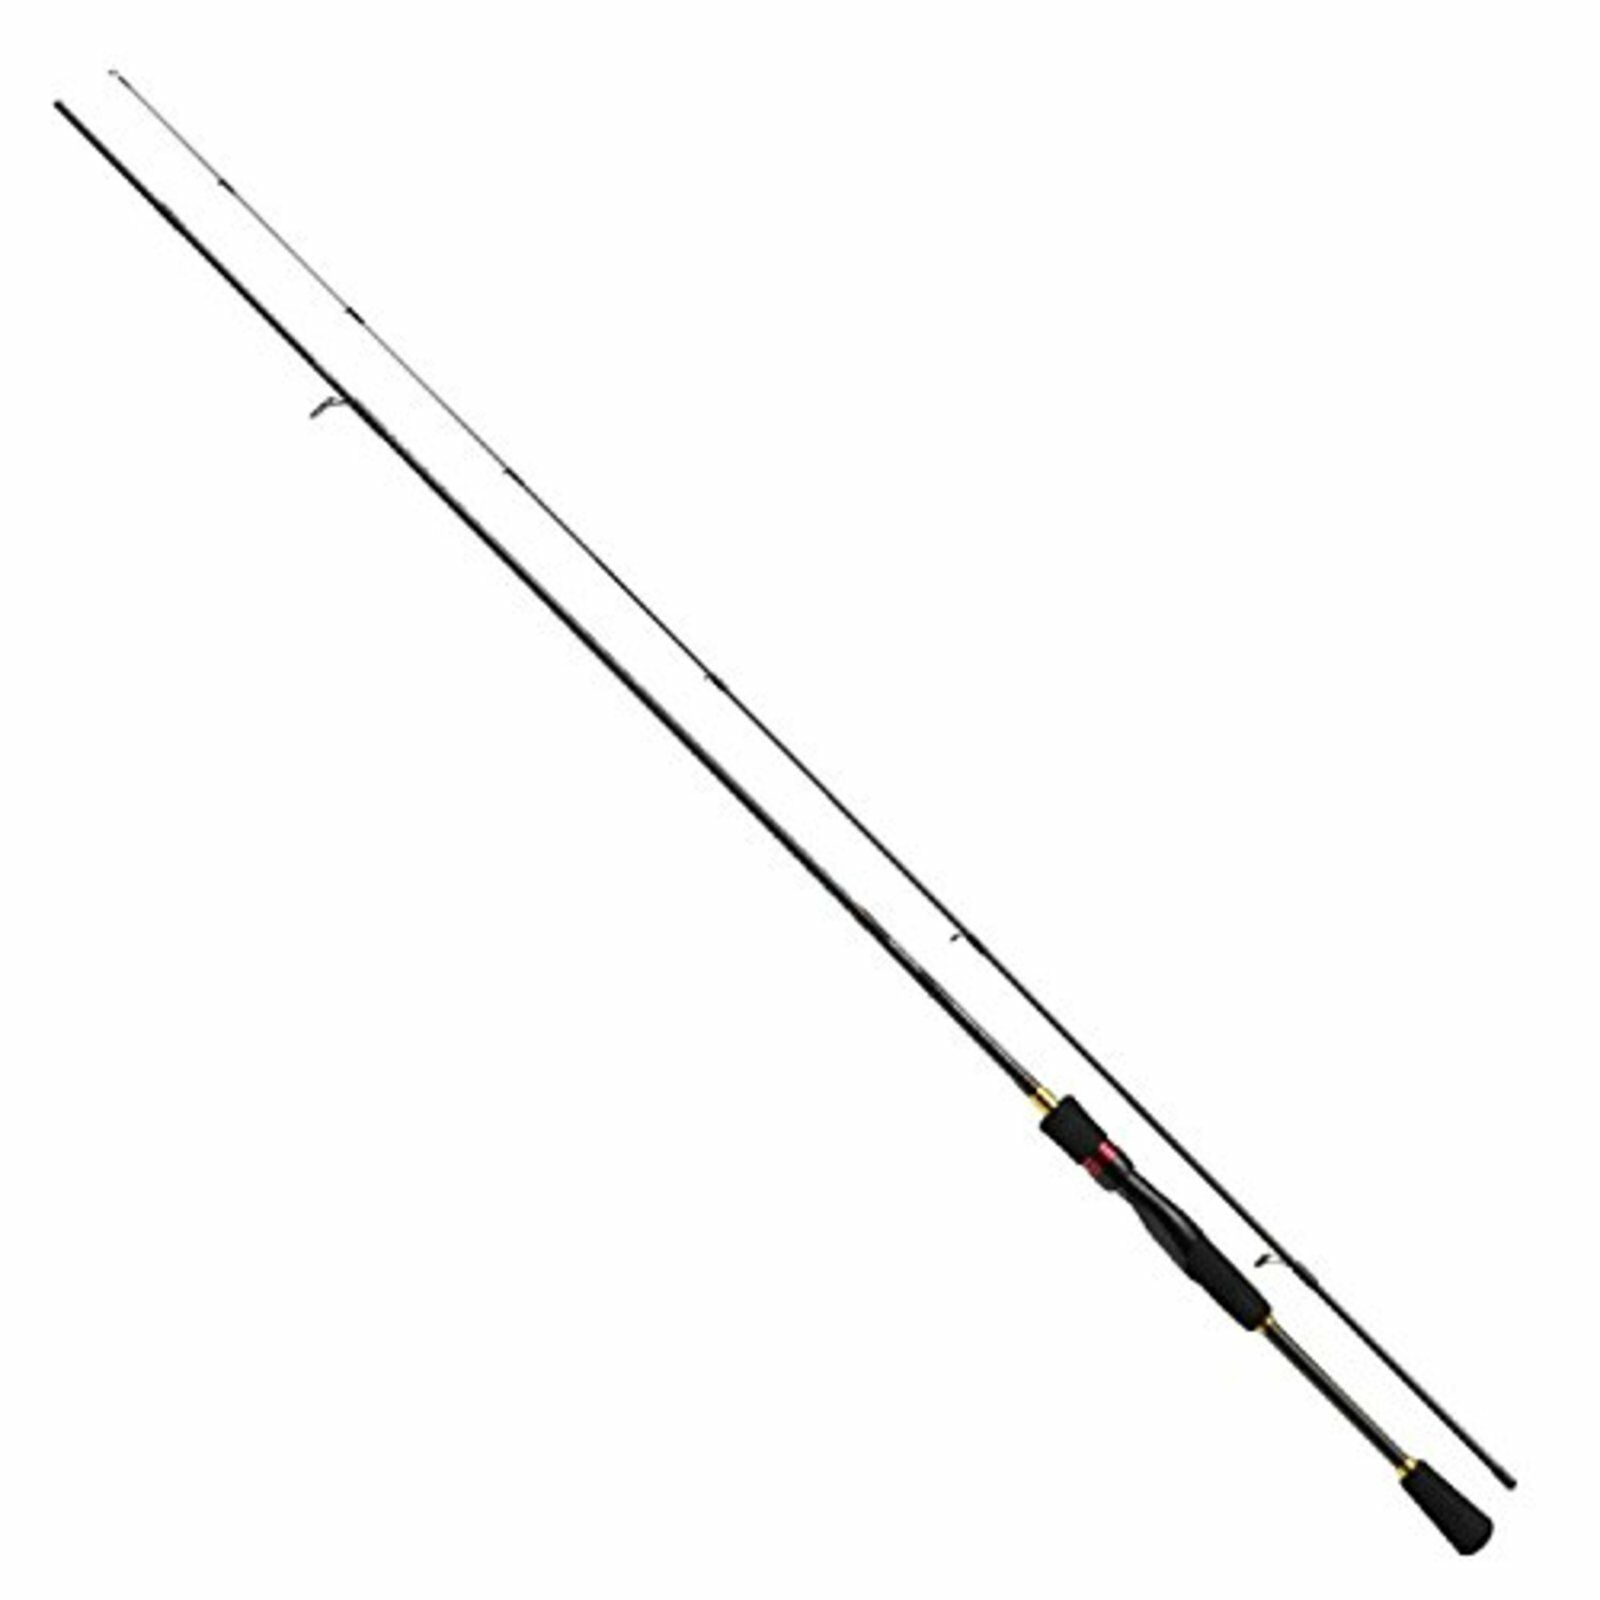 Daiwa Mebaring x 74ULS  Ultra Leggero Colata Pesca Spinning Canna F  S&W